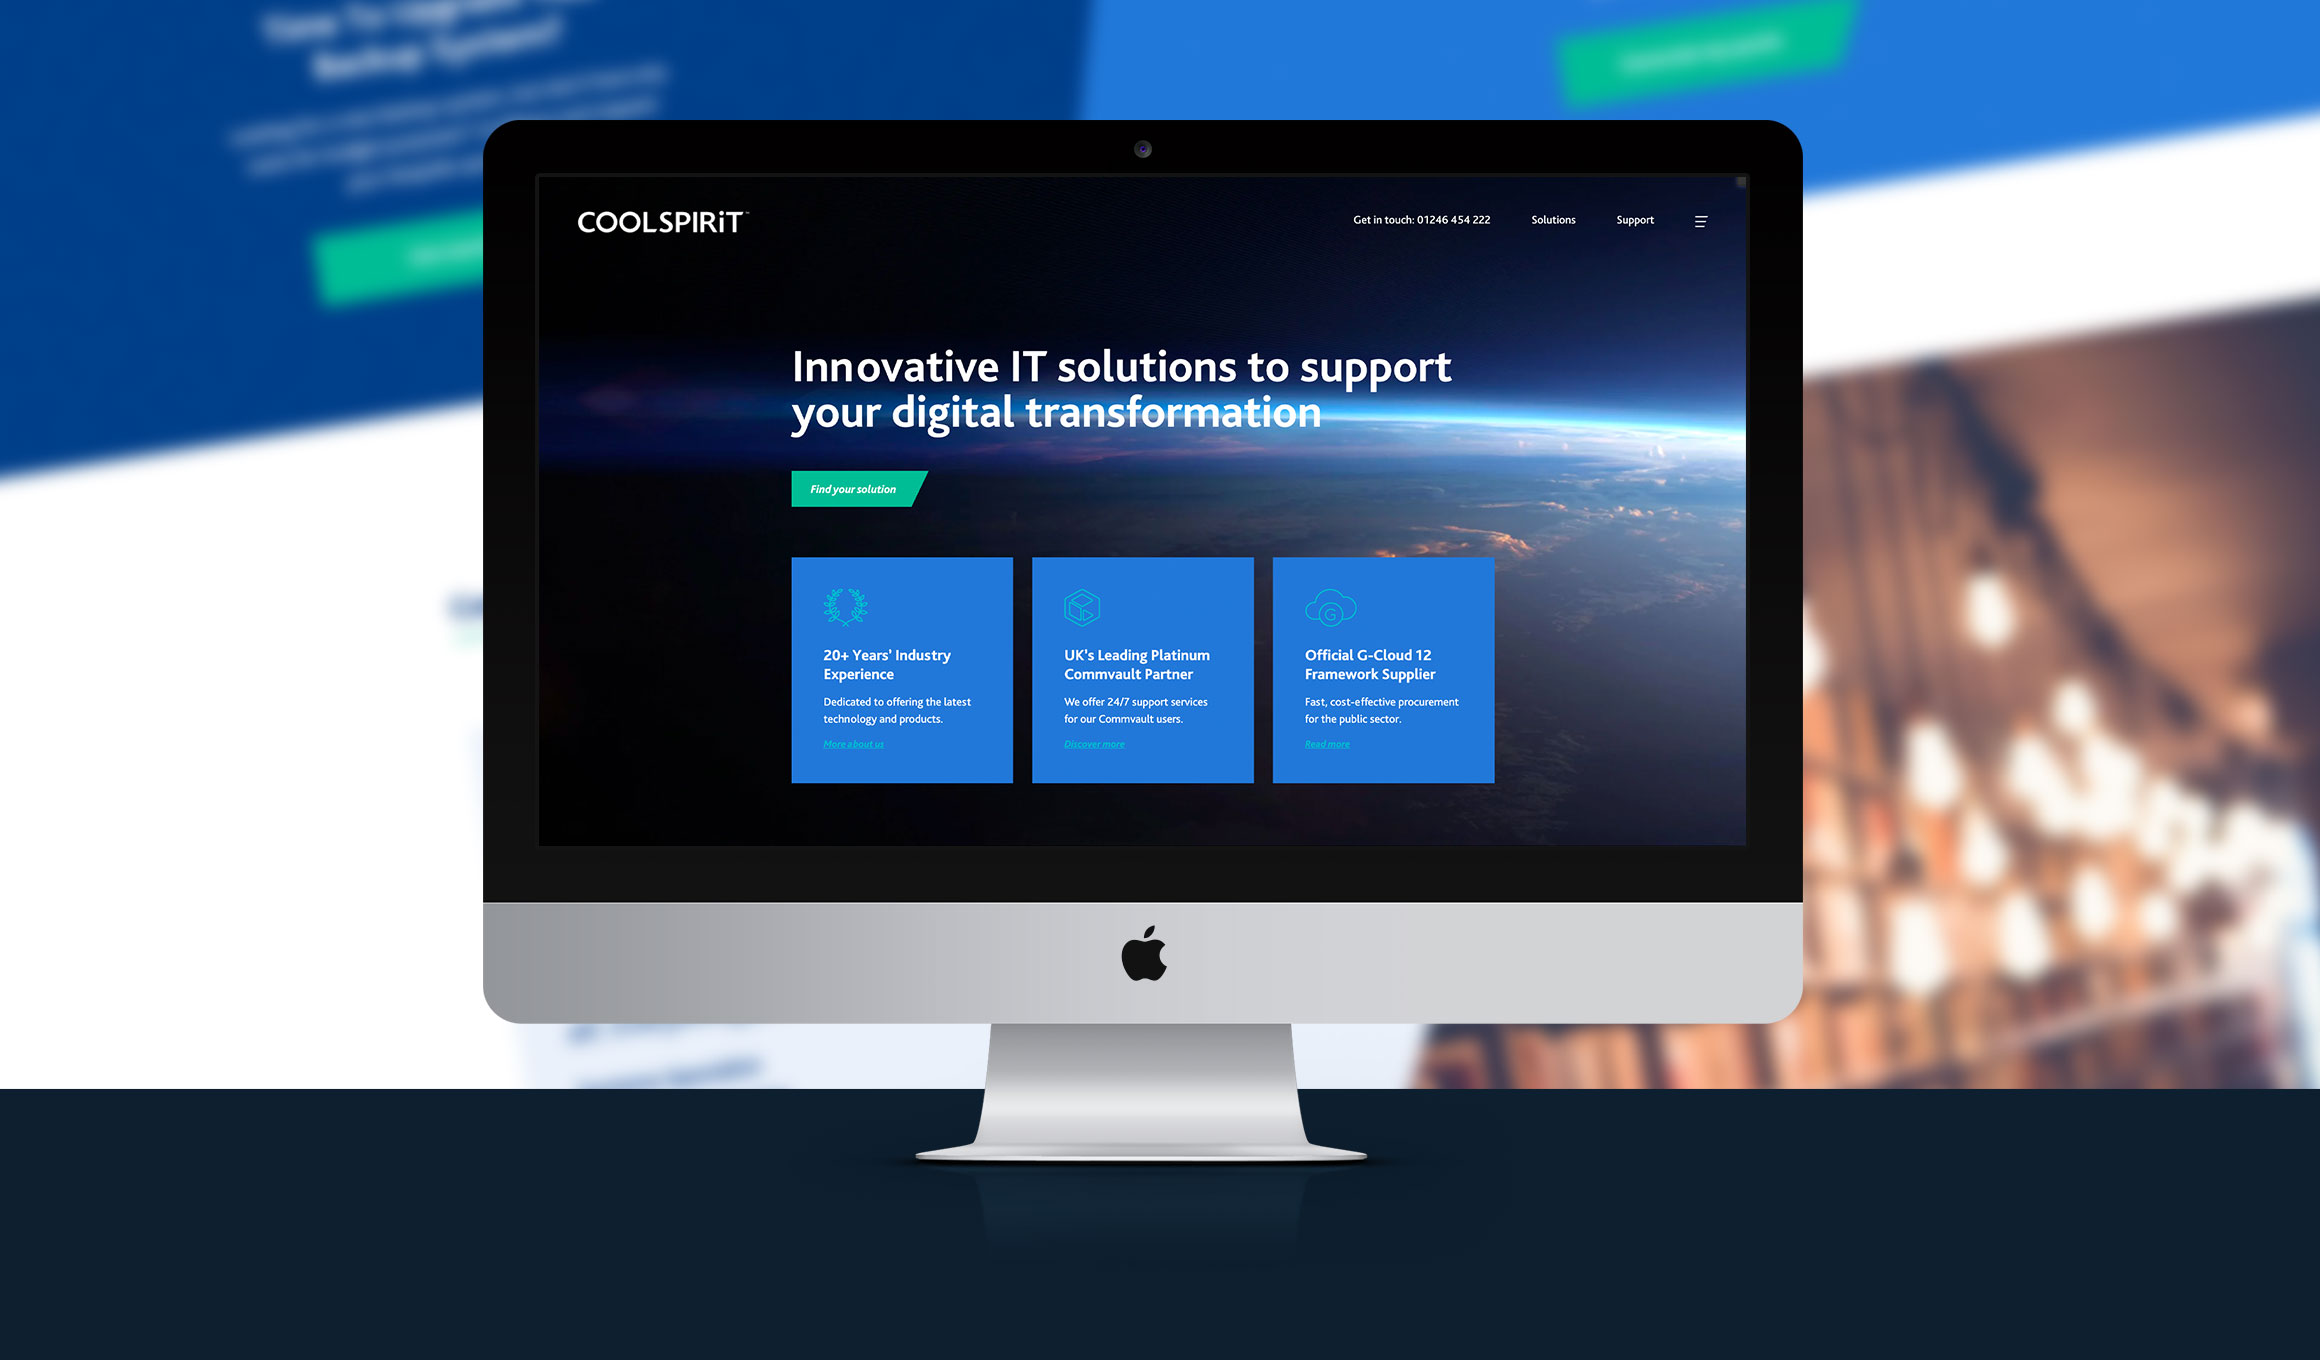 coolspirit-imac-website-case-study